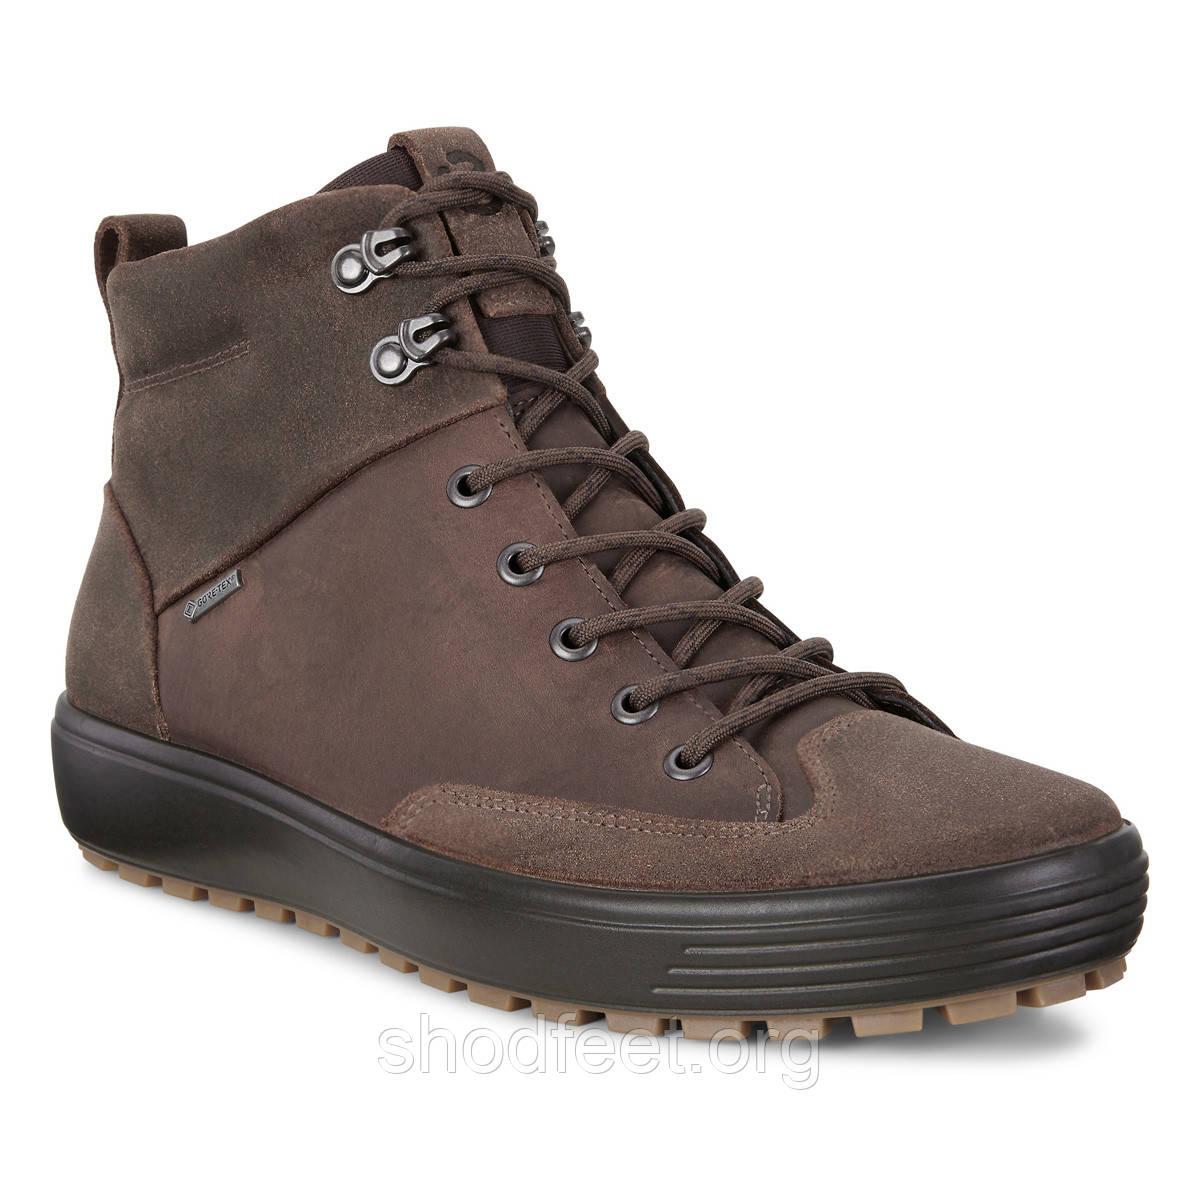 Мужские ботинки Ecco Soft 7 Tred Gore-Tex 450114-55778